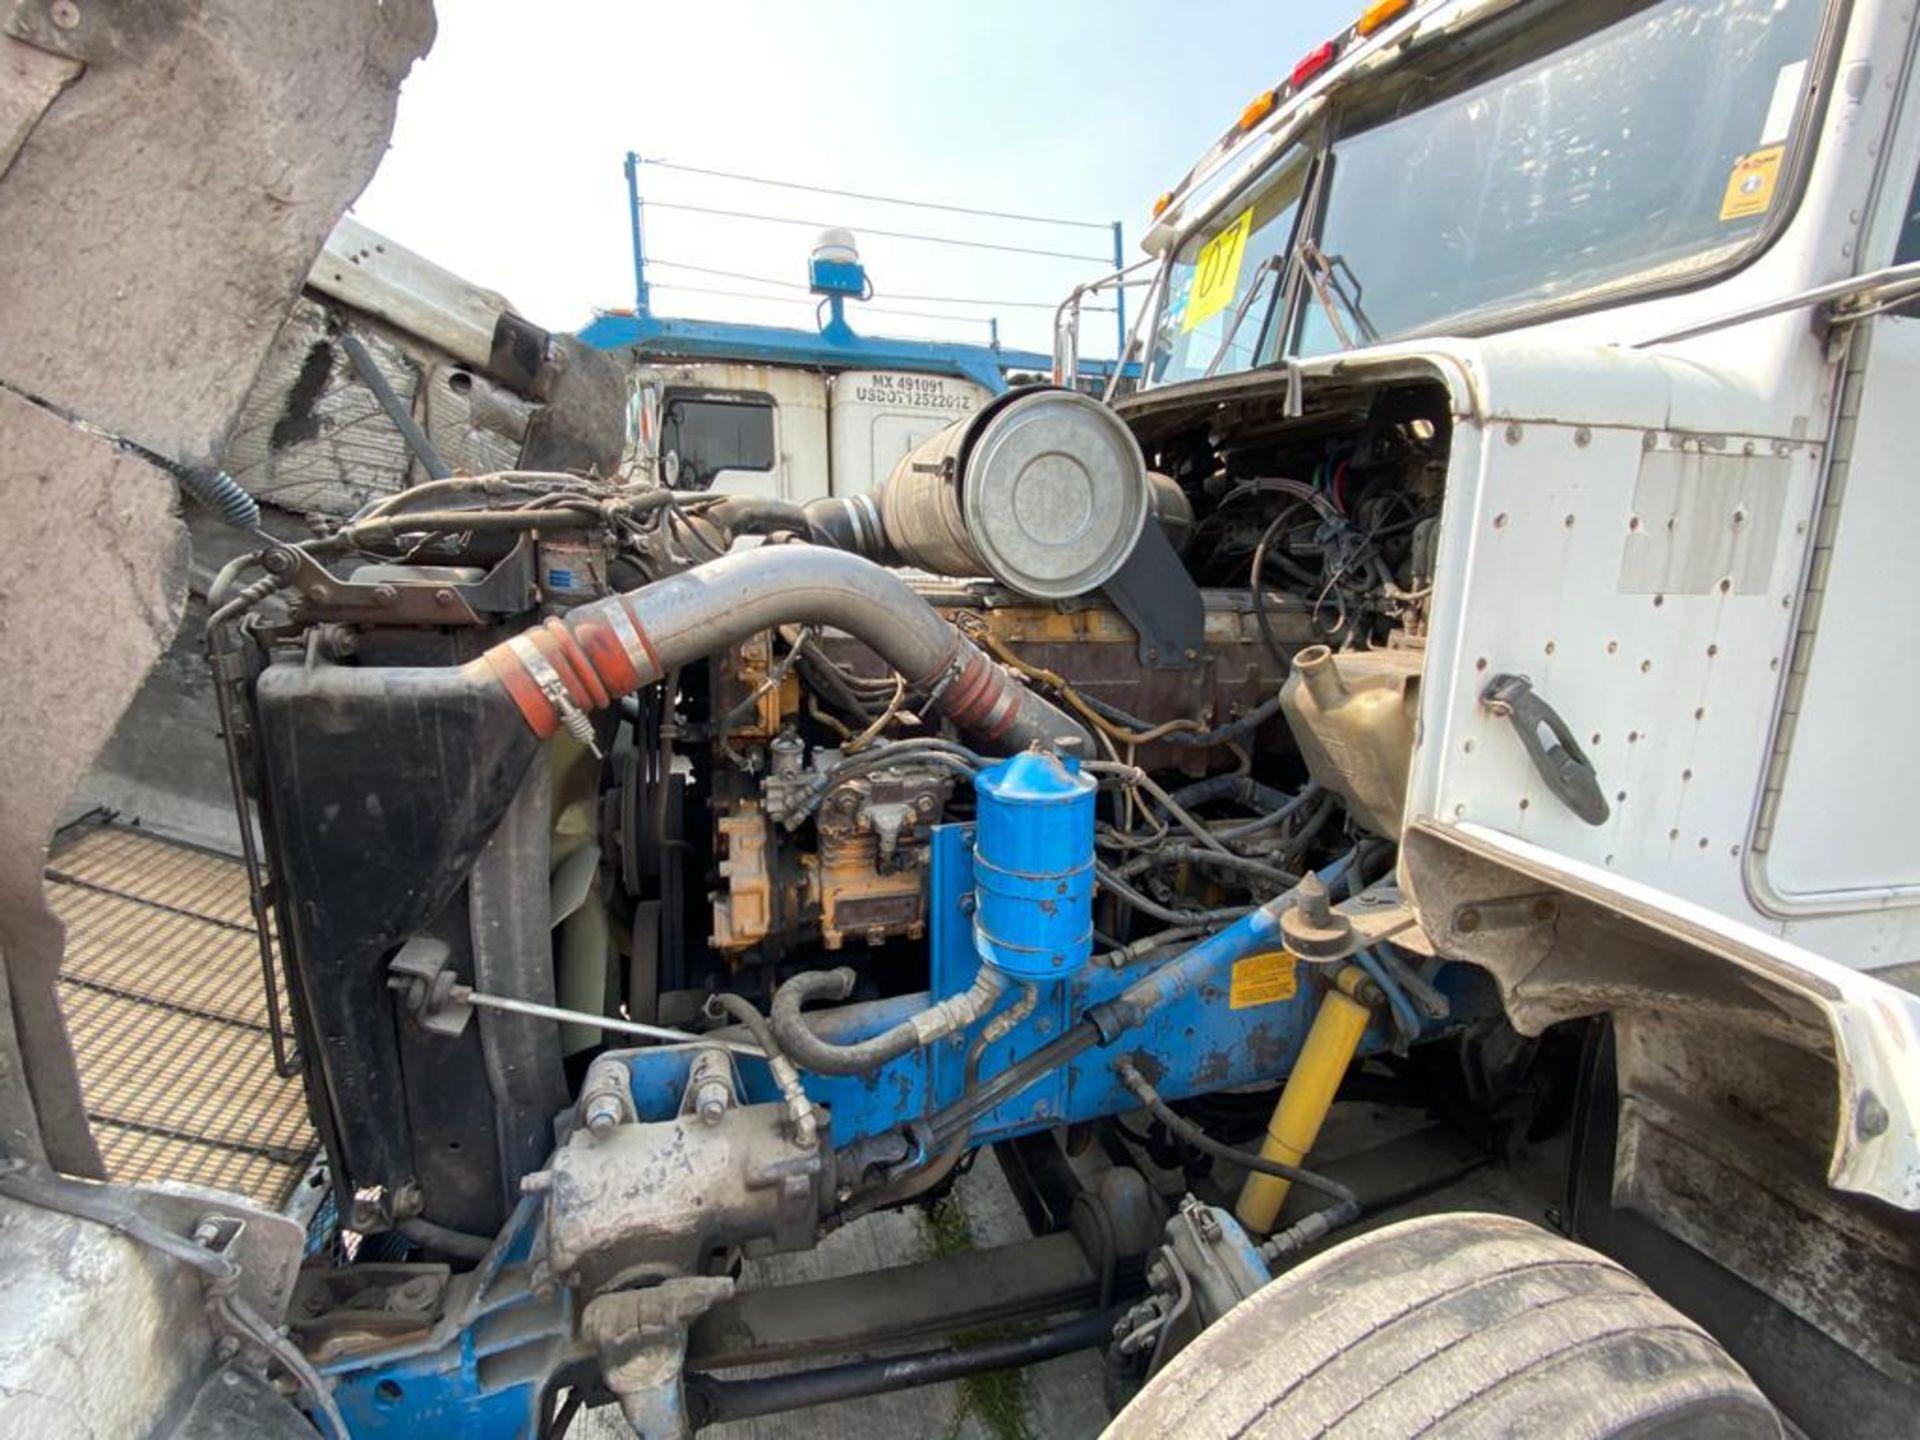 1999 Kenworth Sleeper truck tractor, standard transmission of 18 speeds - Image 53 of 72